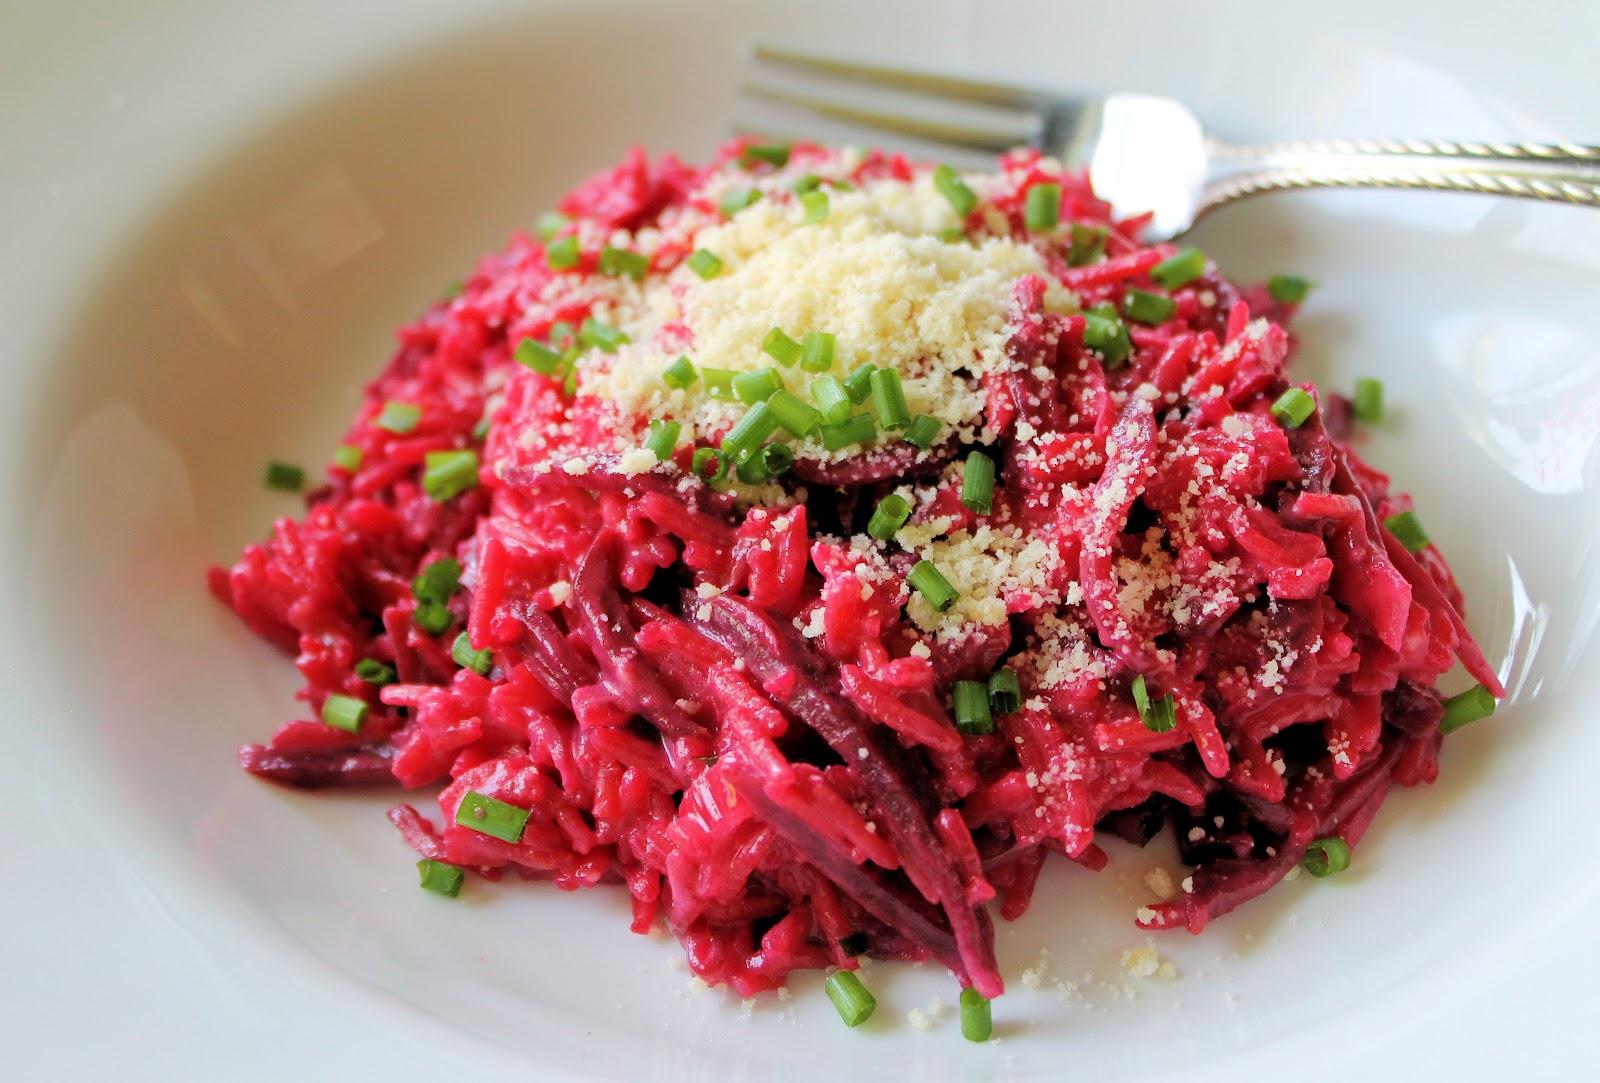 Savoir faire cocinar en technicolor risotto con for Cocinar remolacha